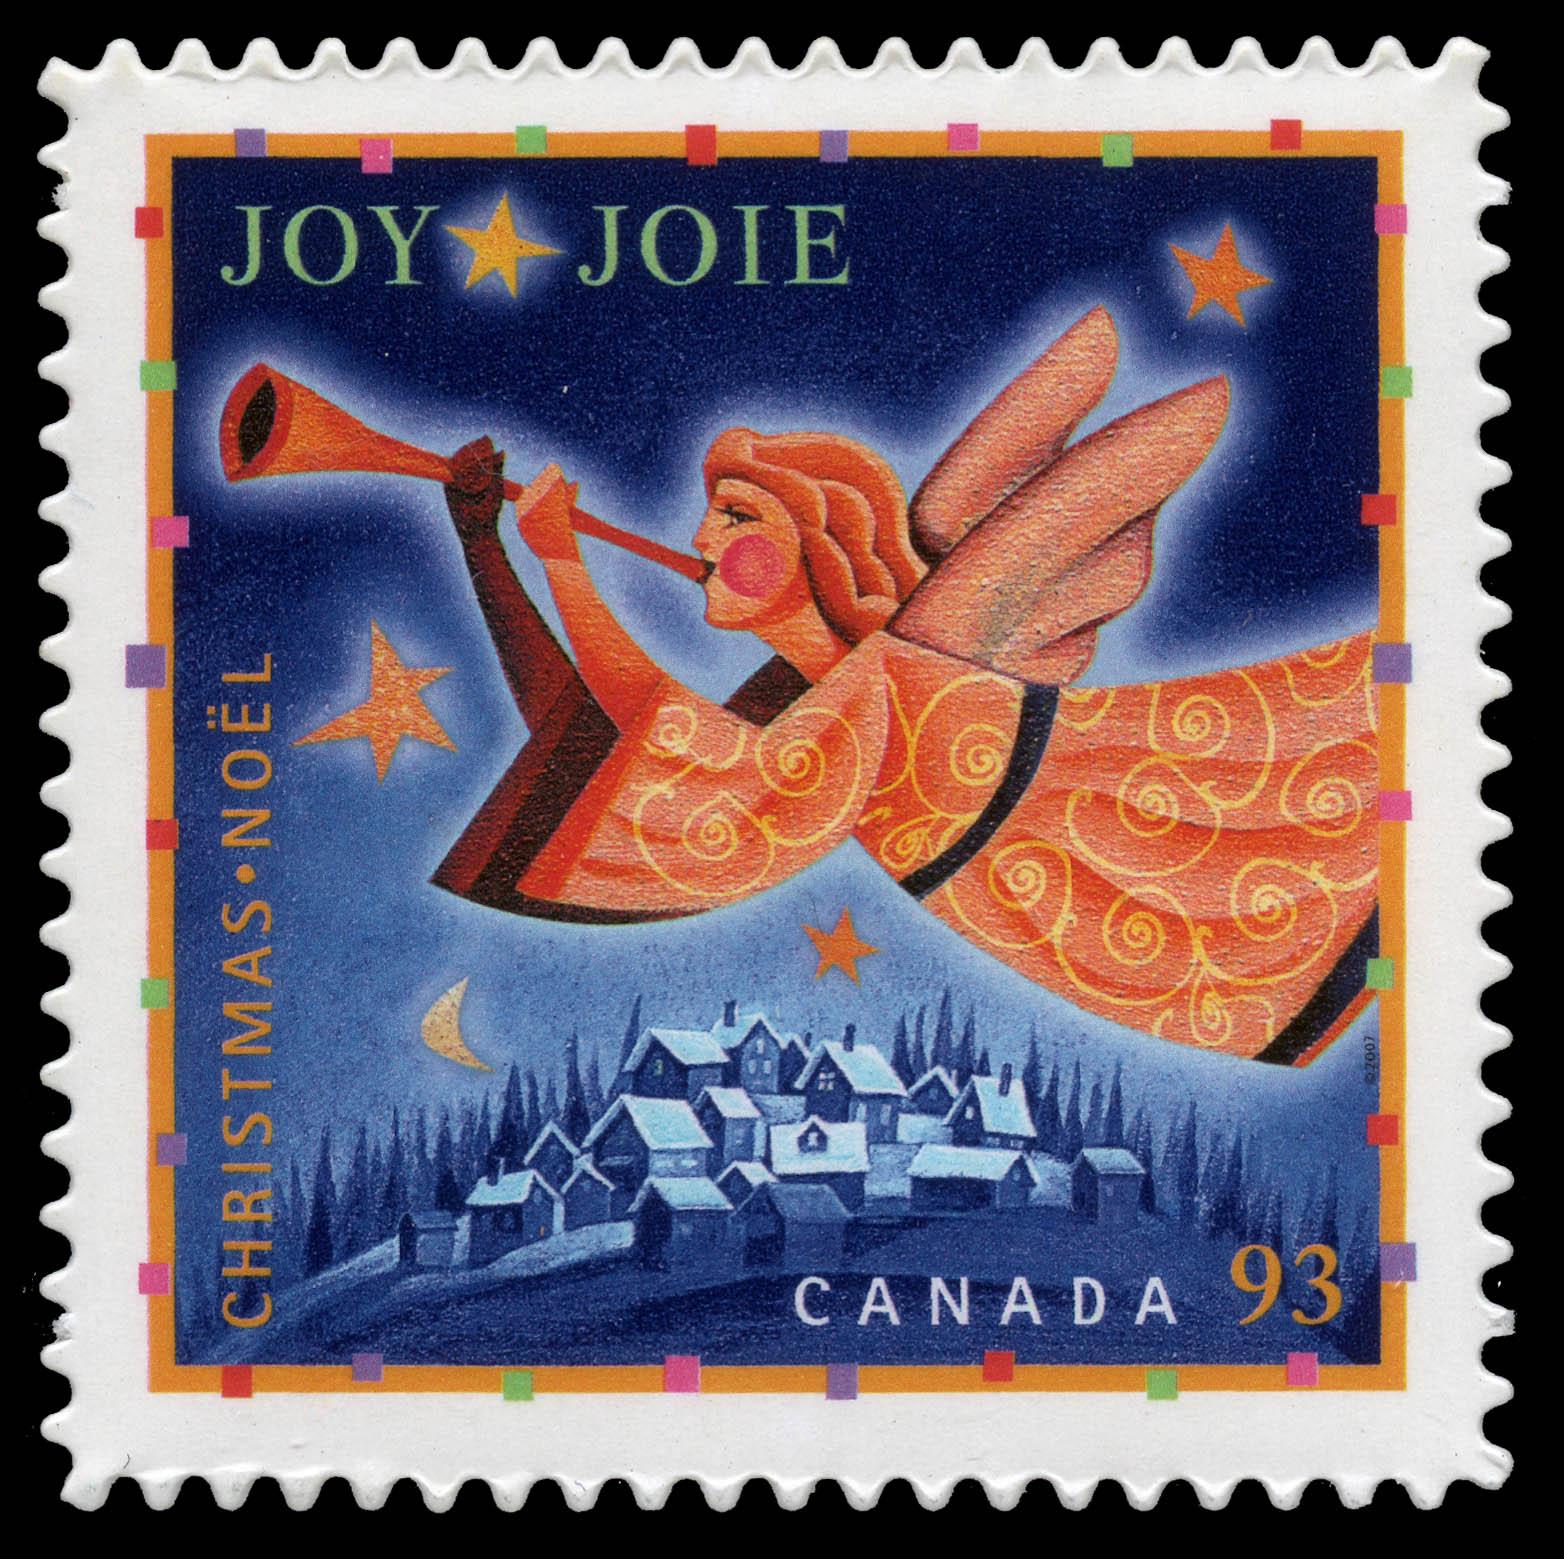 Joy Canada Postage Stamp | Christmas: Hope, Joy and Peace